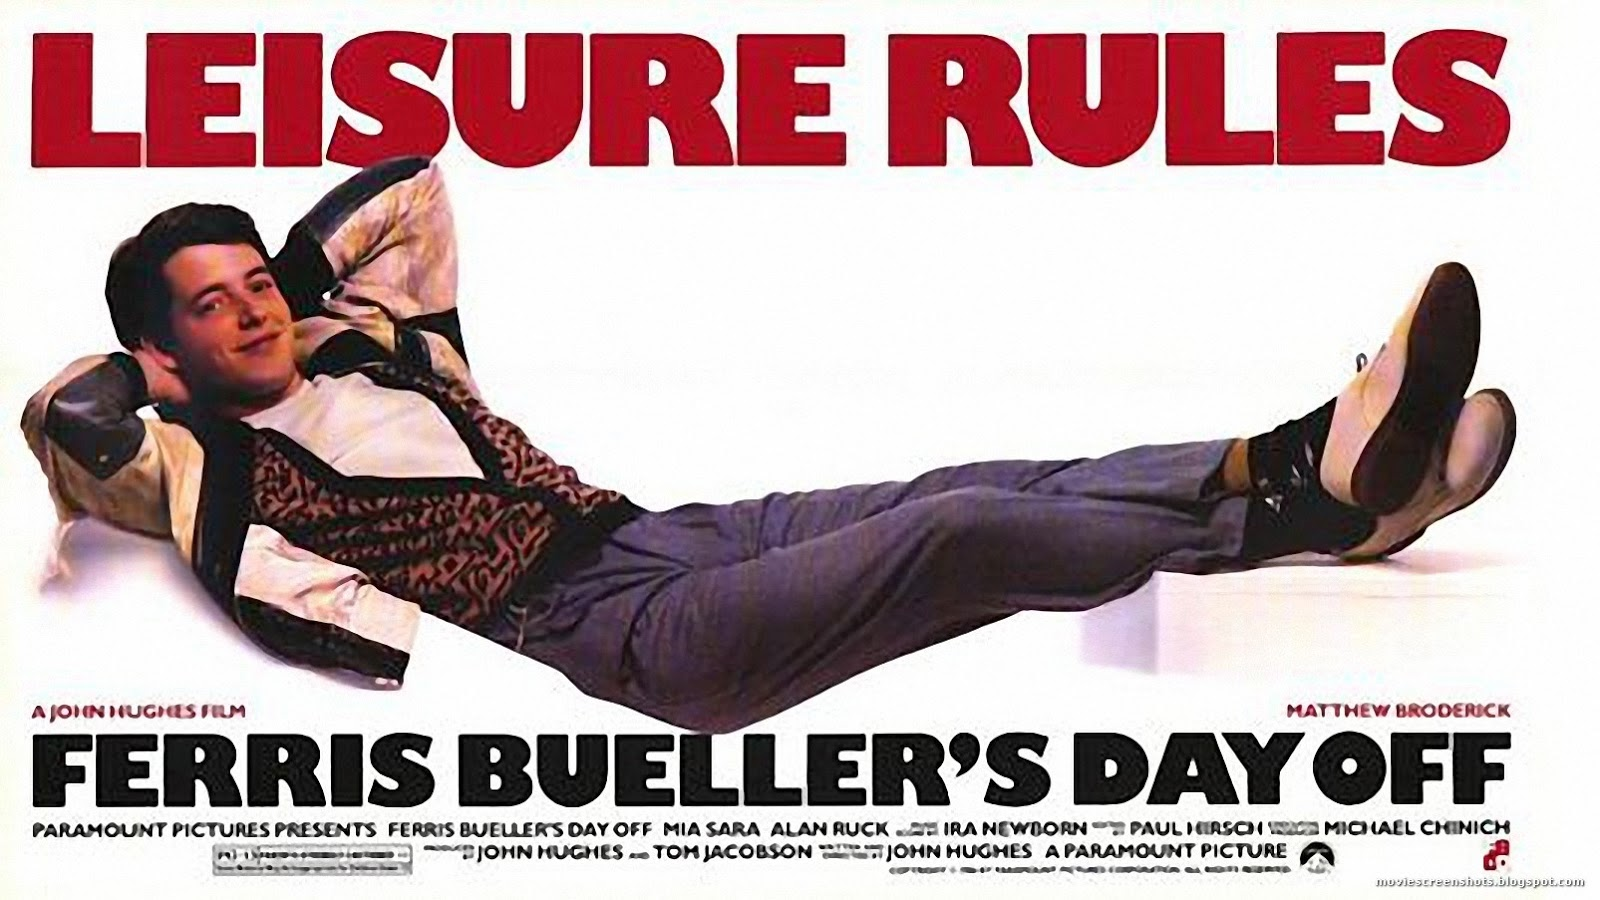 ferris-buellers-day-off-matthew-broderick